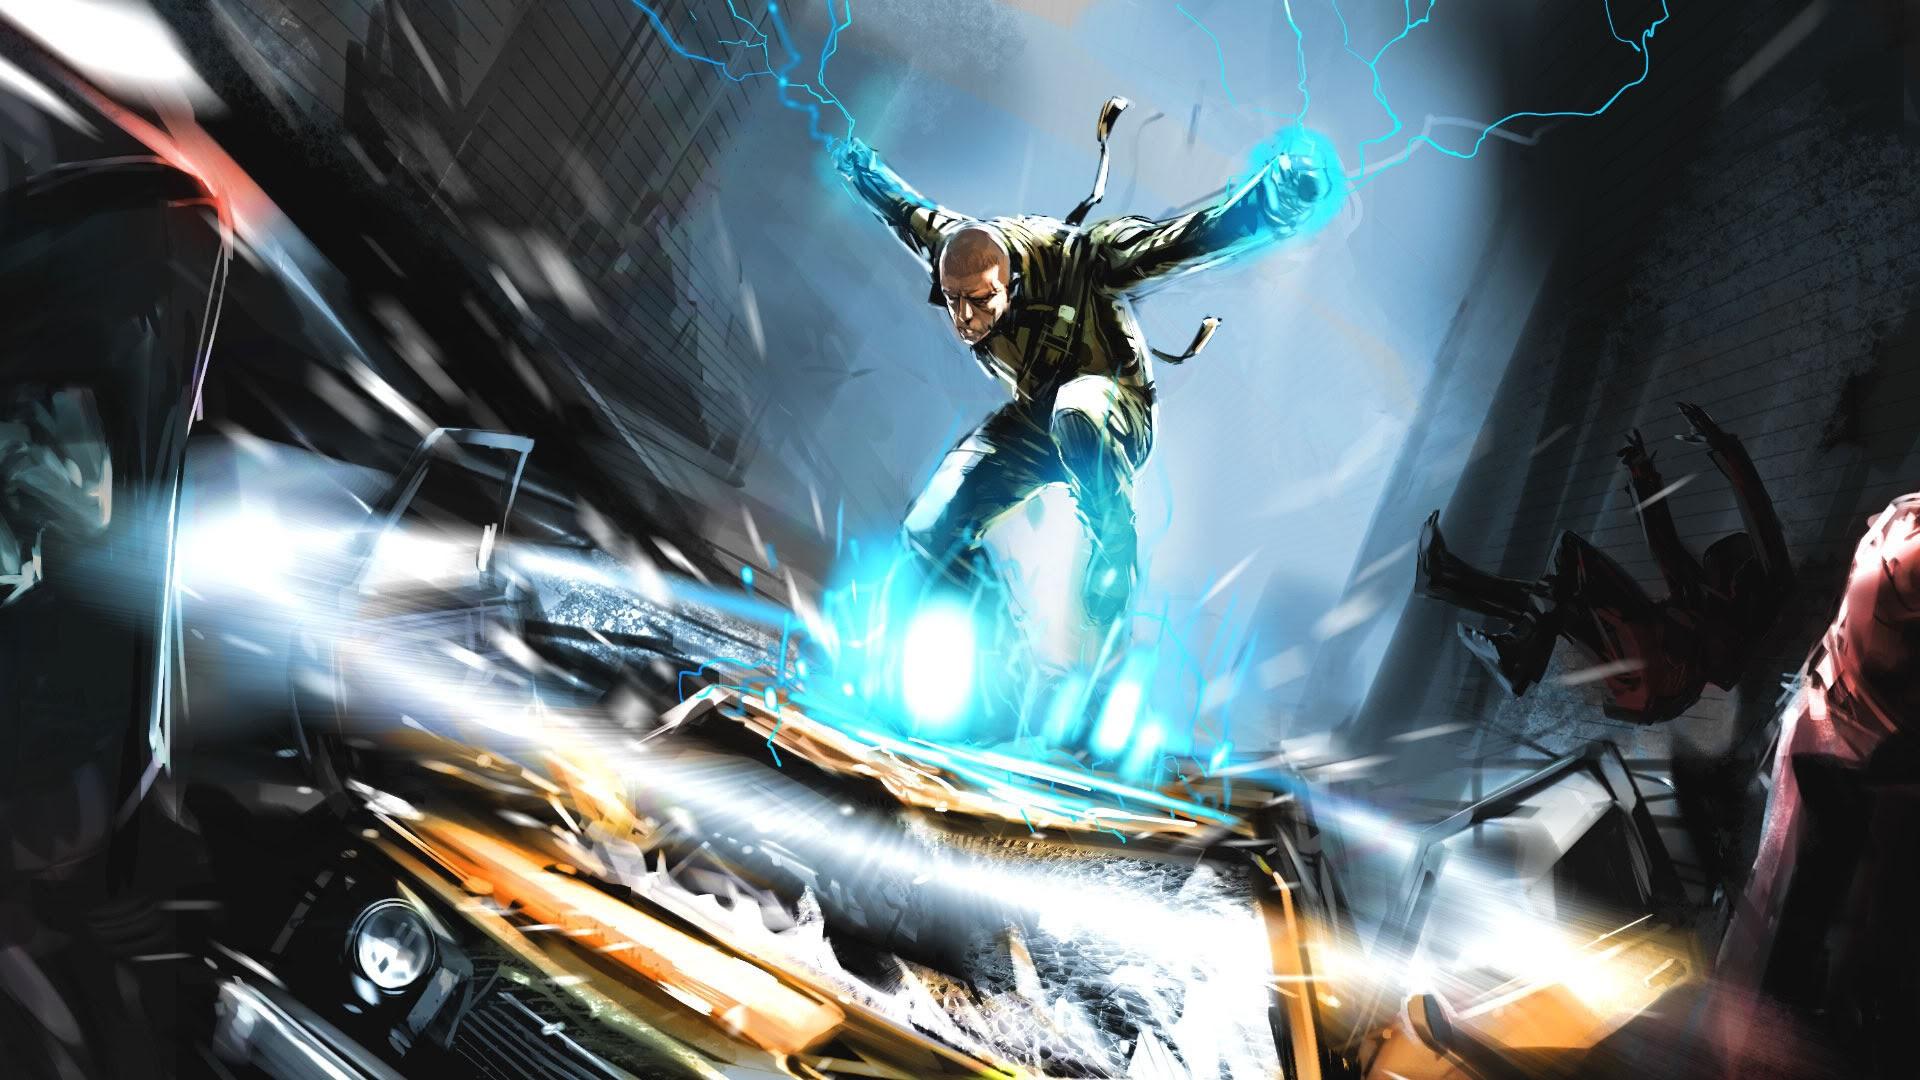 Action Hero HD Wallpaper - HD Wallpapers